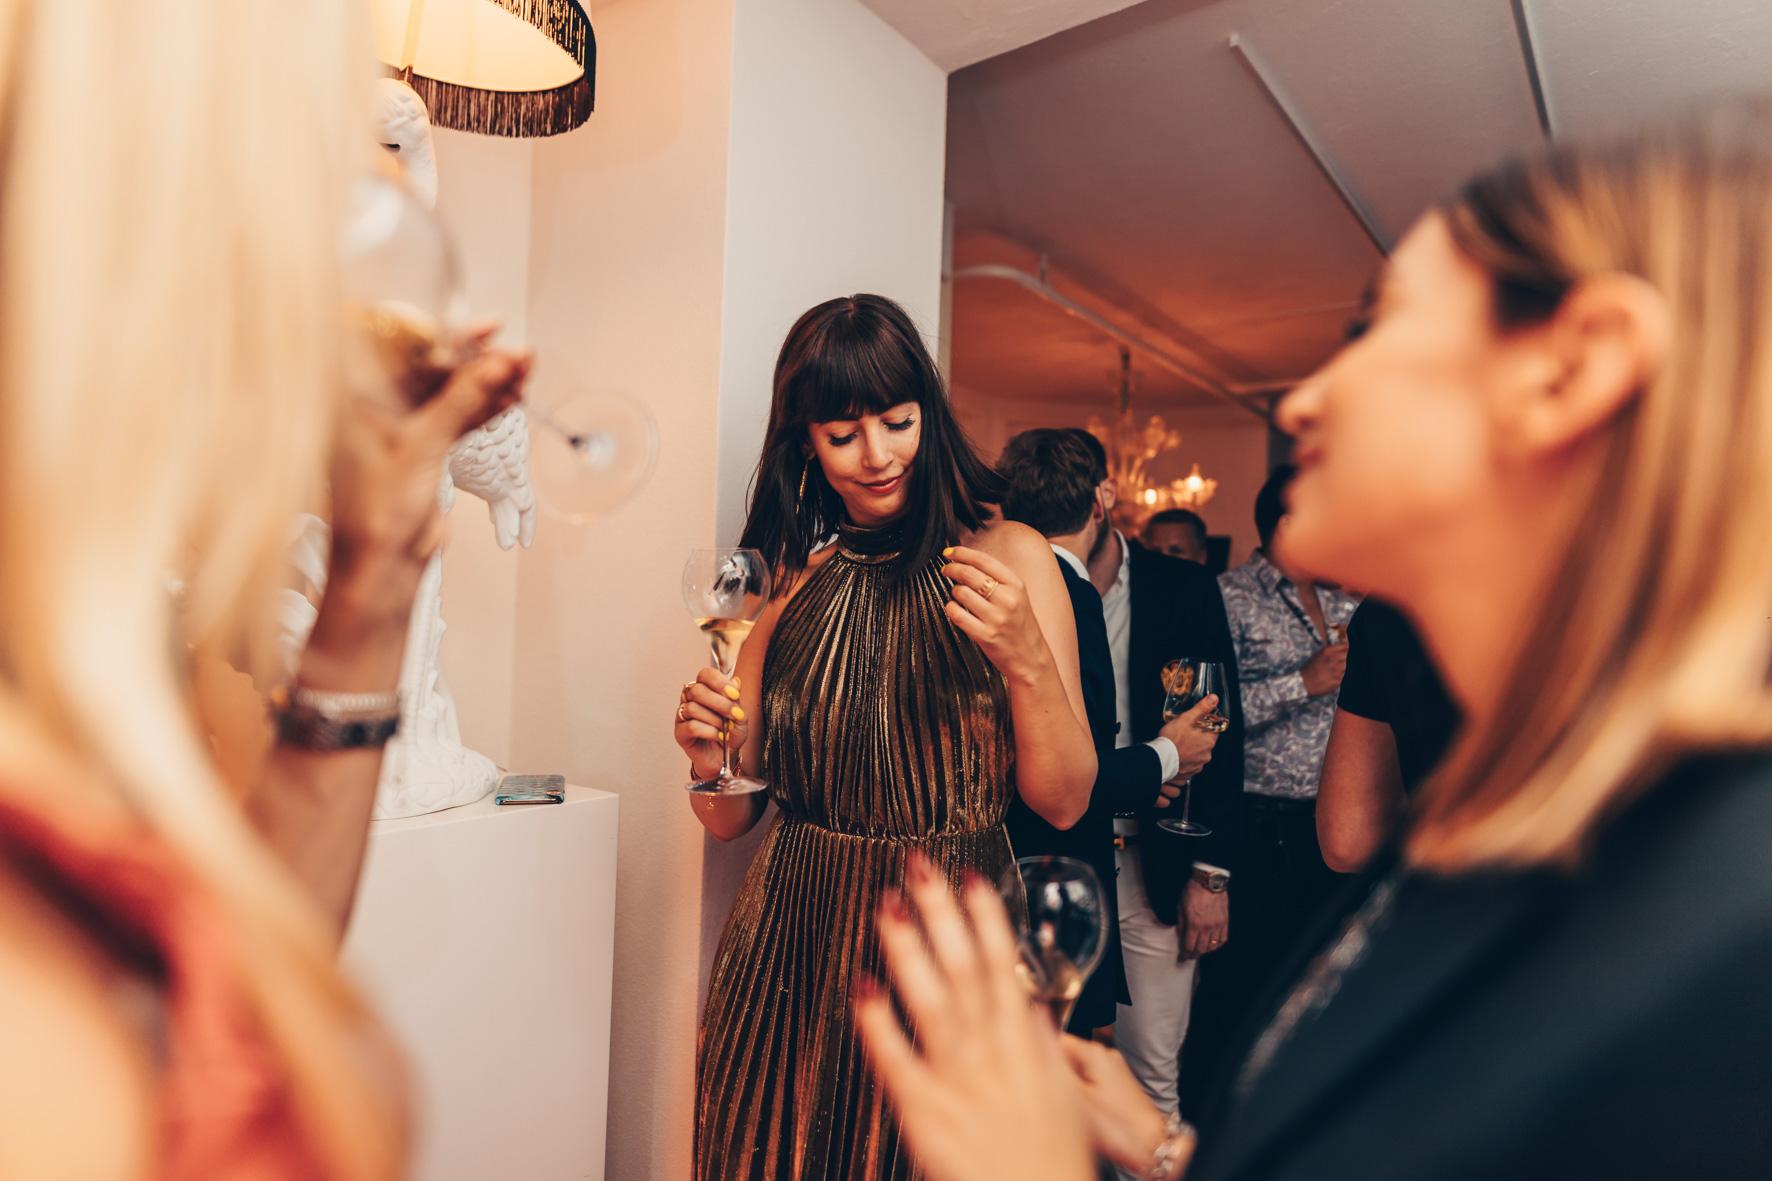 Konrad-lifestyle-art-basel-%22rollsroyce%22-2019-173.jpg